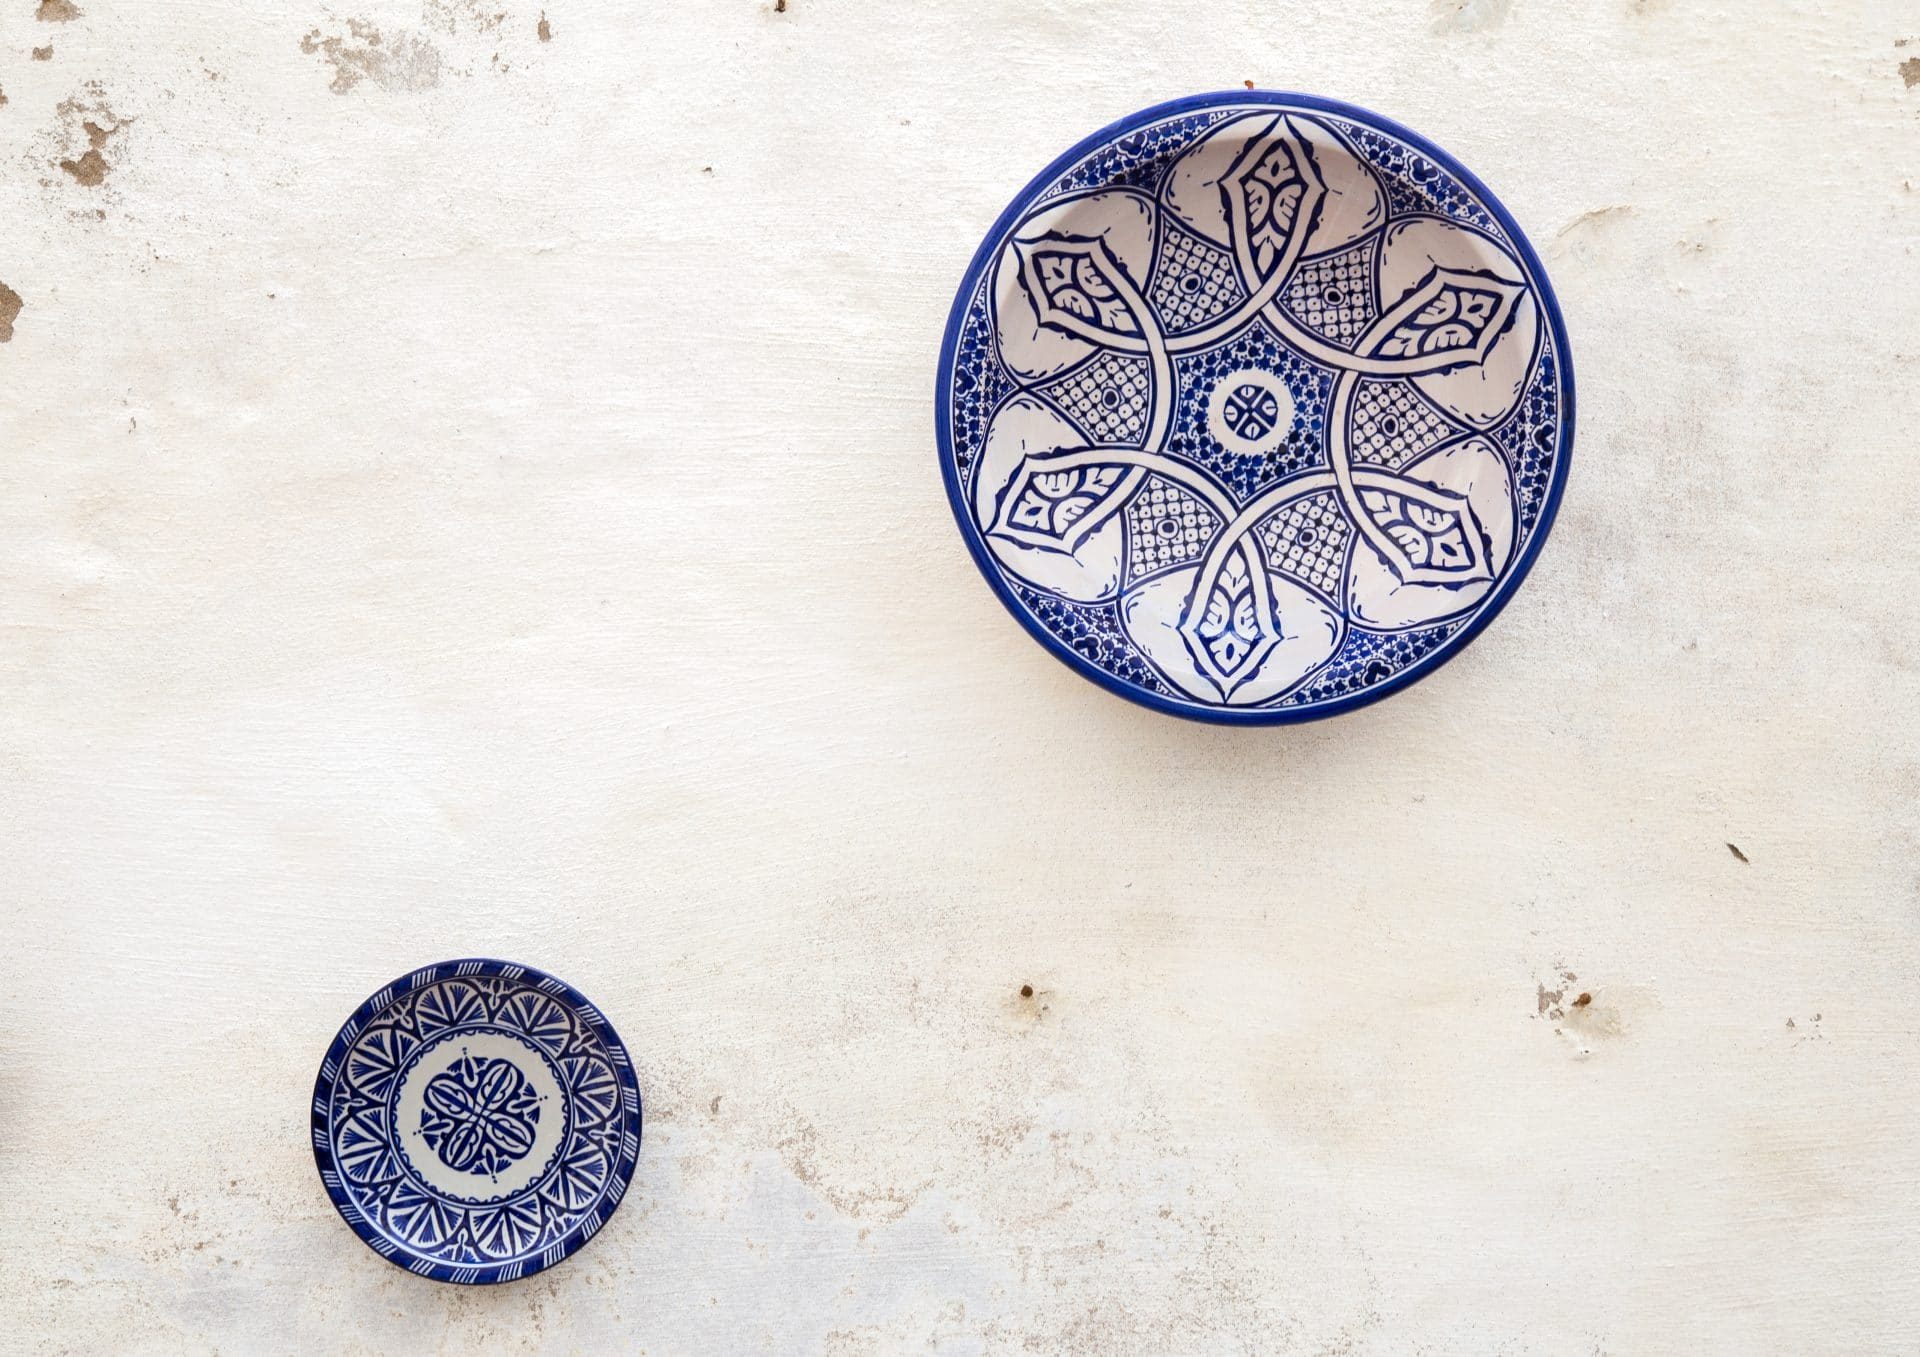 Marrakech souk shopping guide - trips to Morocco